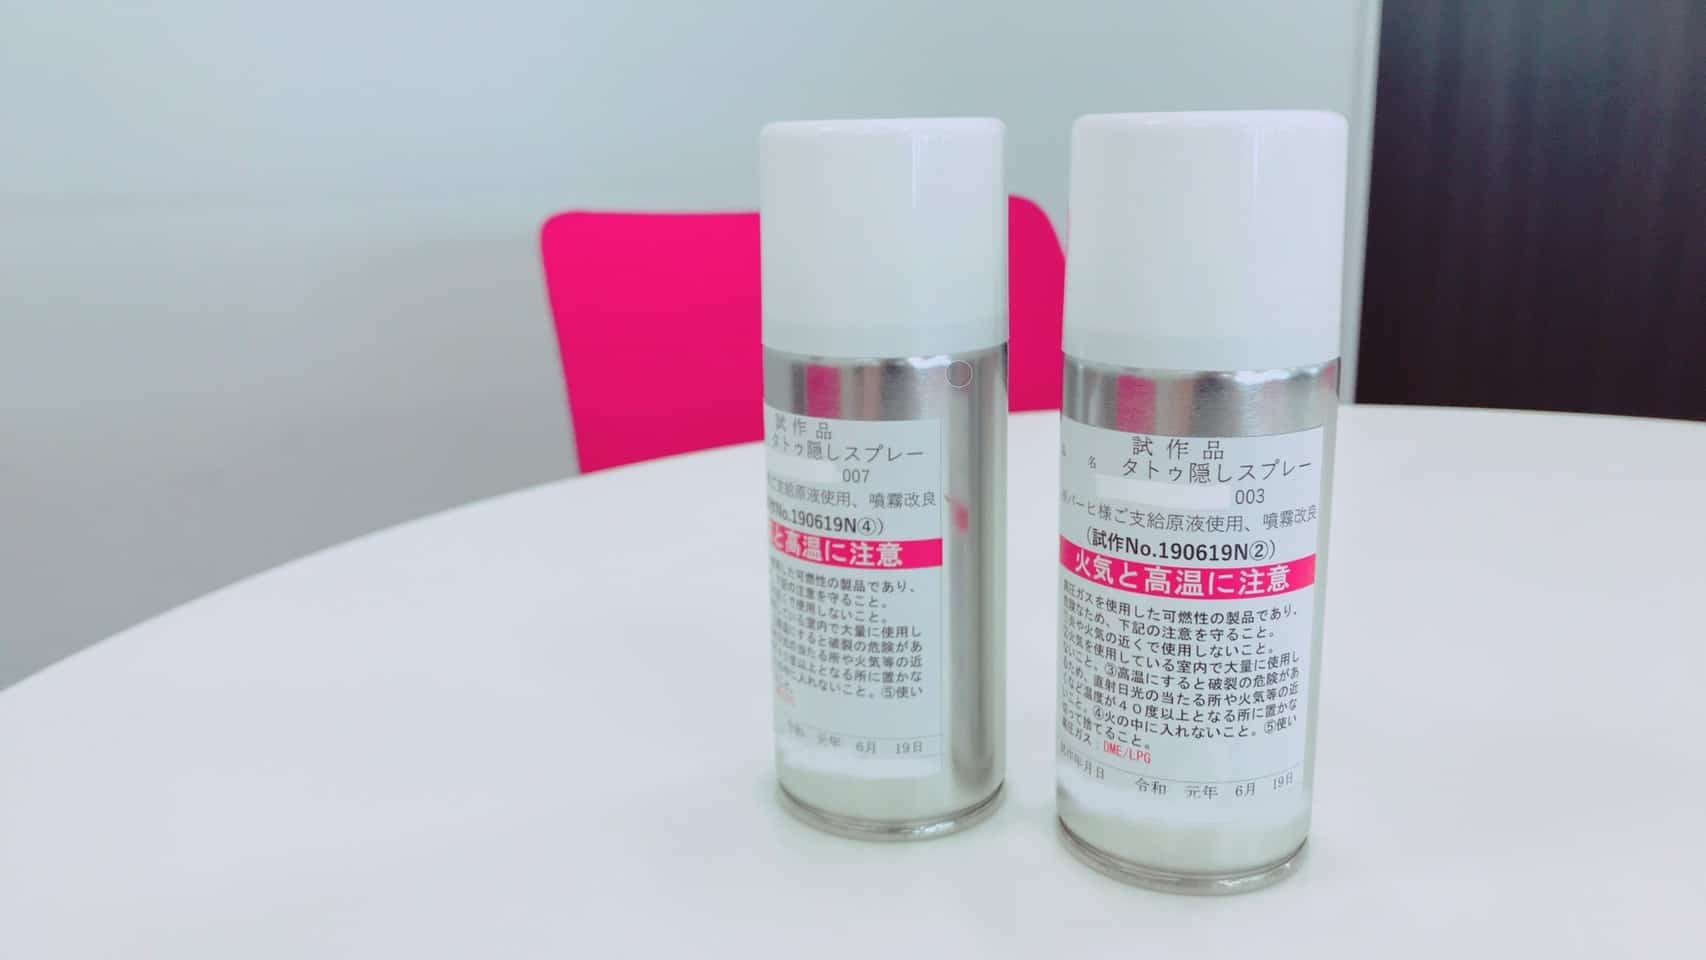 Body Concealer สเปรย์ปกปิดรอยสัก วิจัยโดยนางายามะ อากิโอะ (Akio Nagayama)